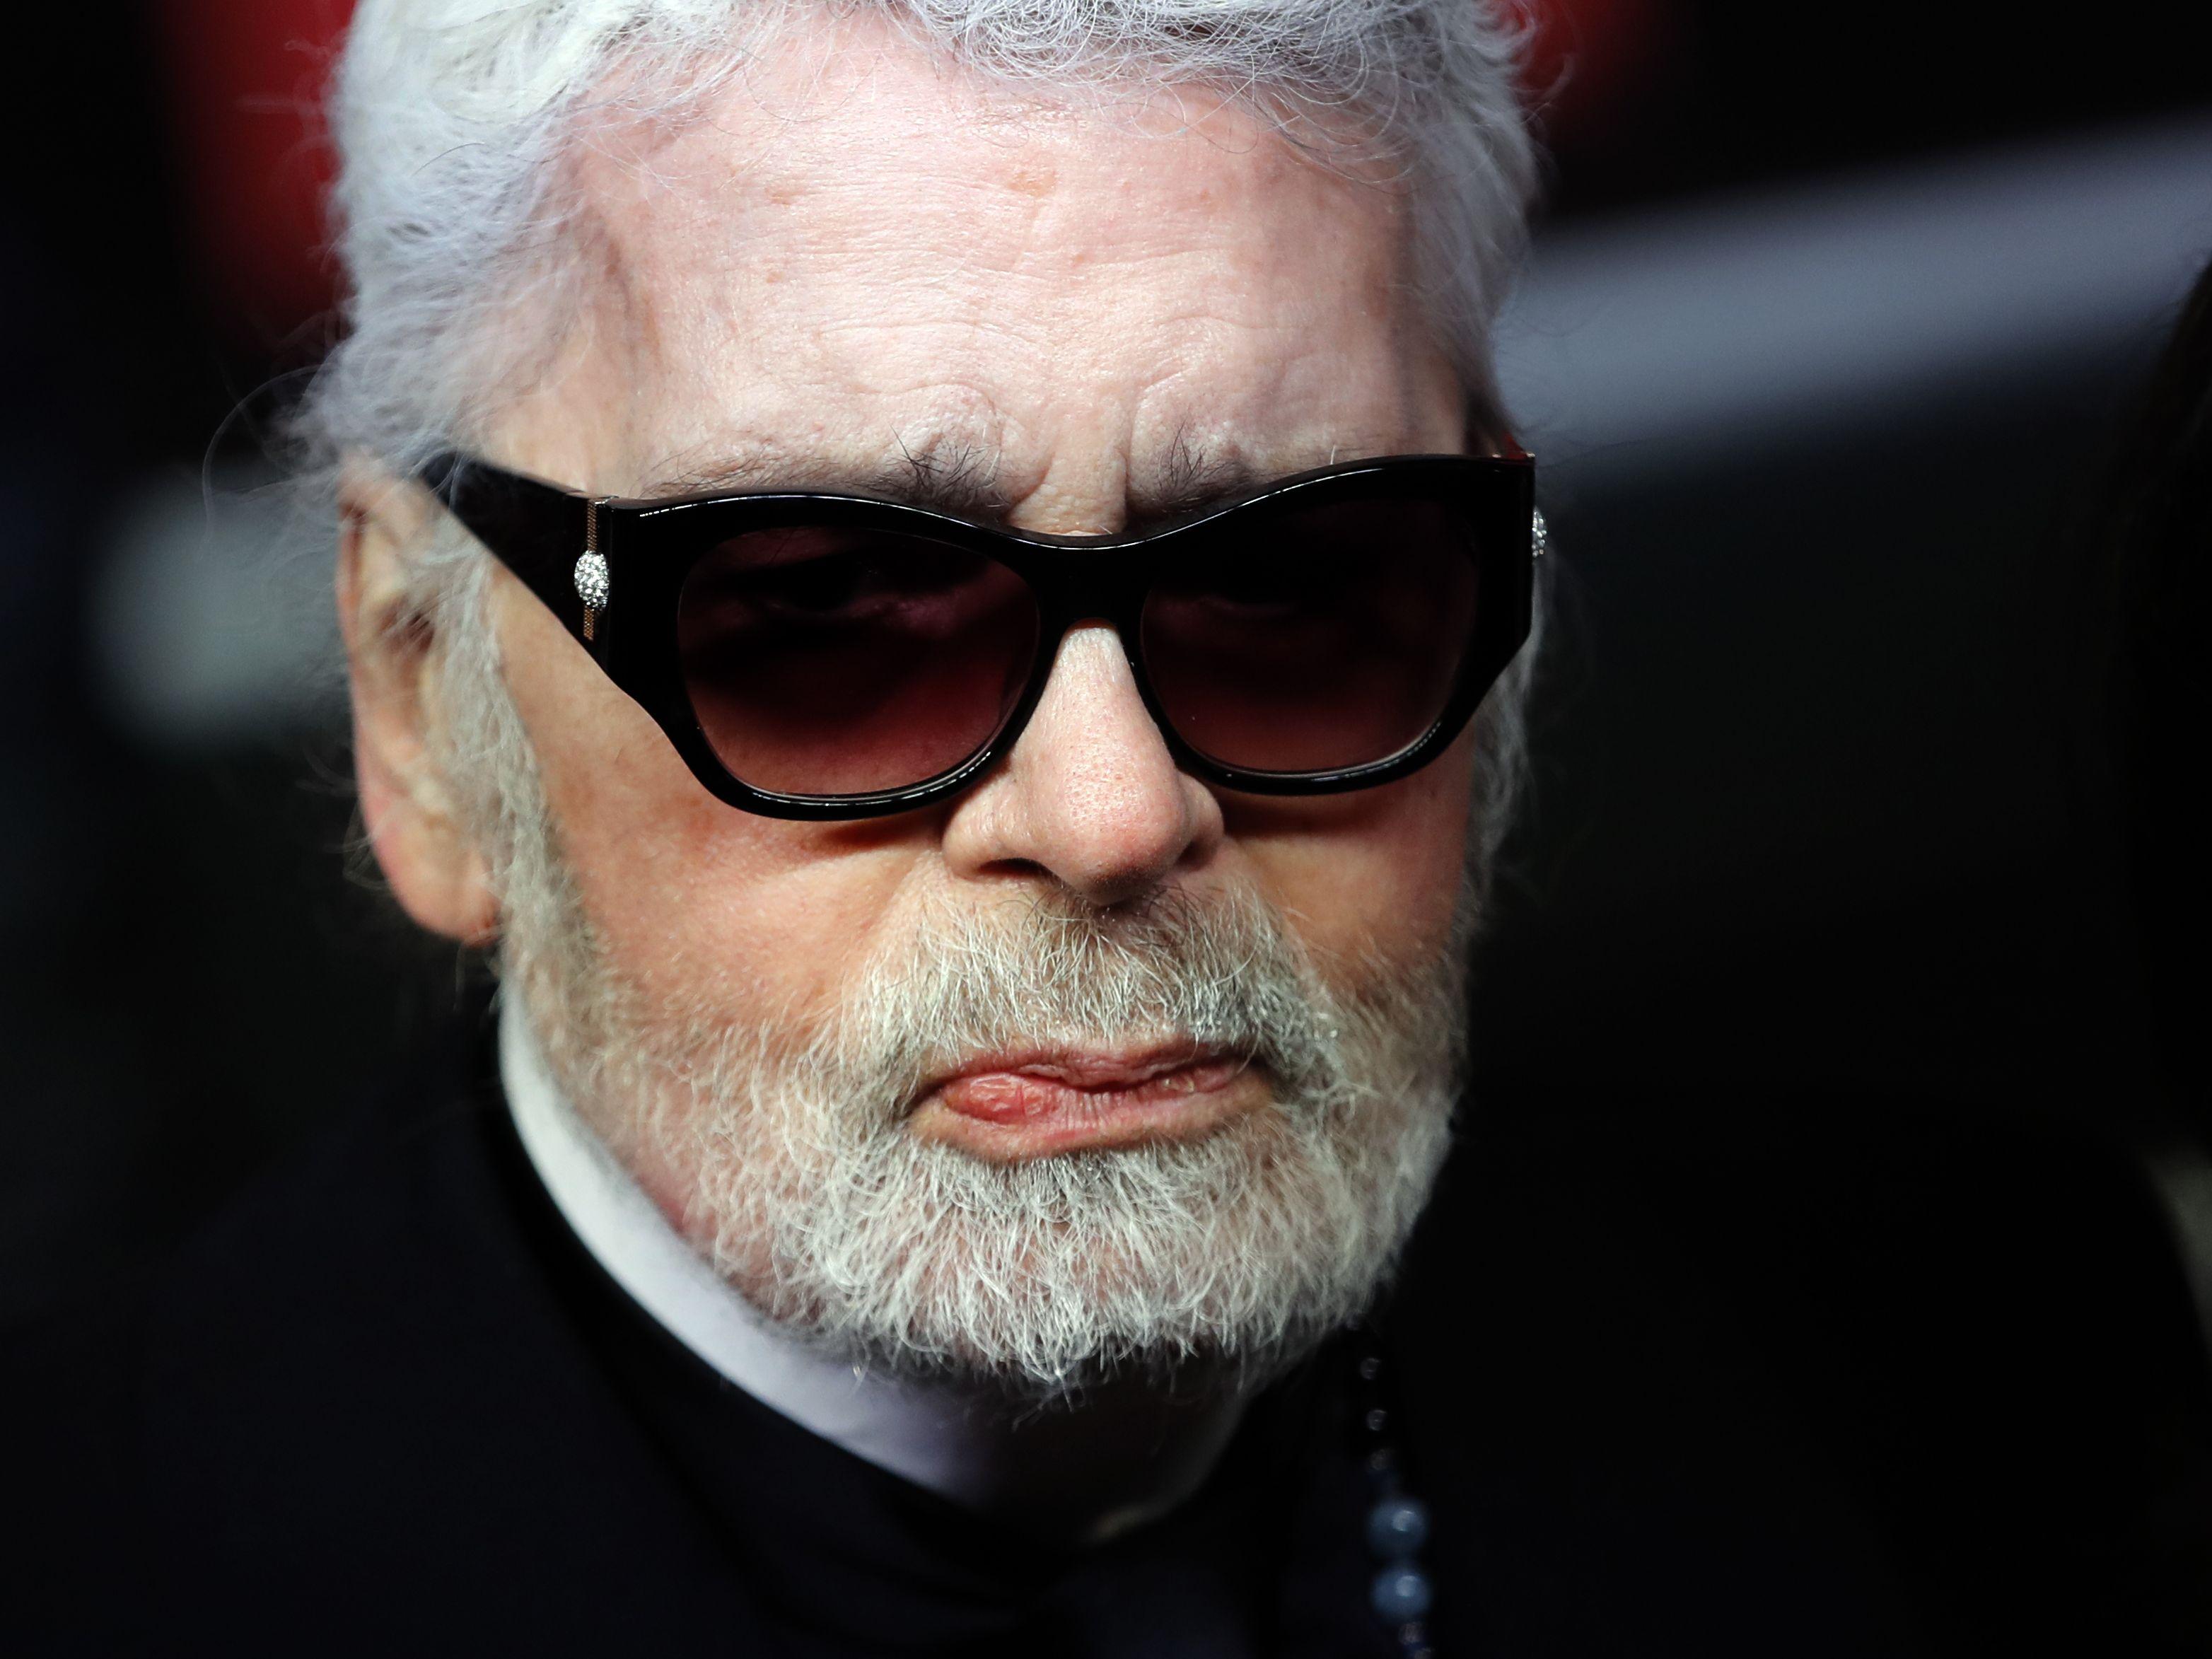 Chanel: Iconic fashion designer Karl Lagerfeld dies at 85